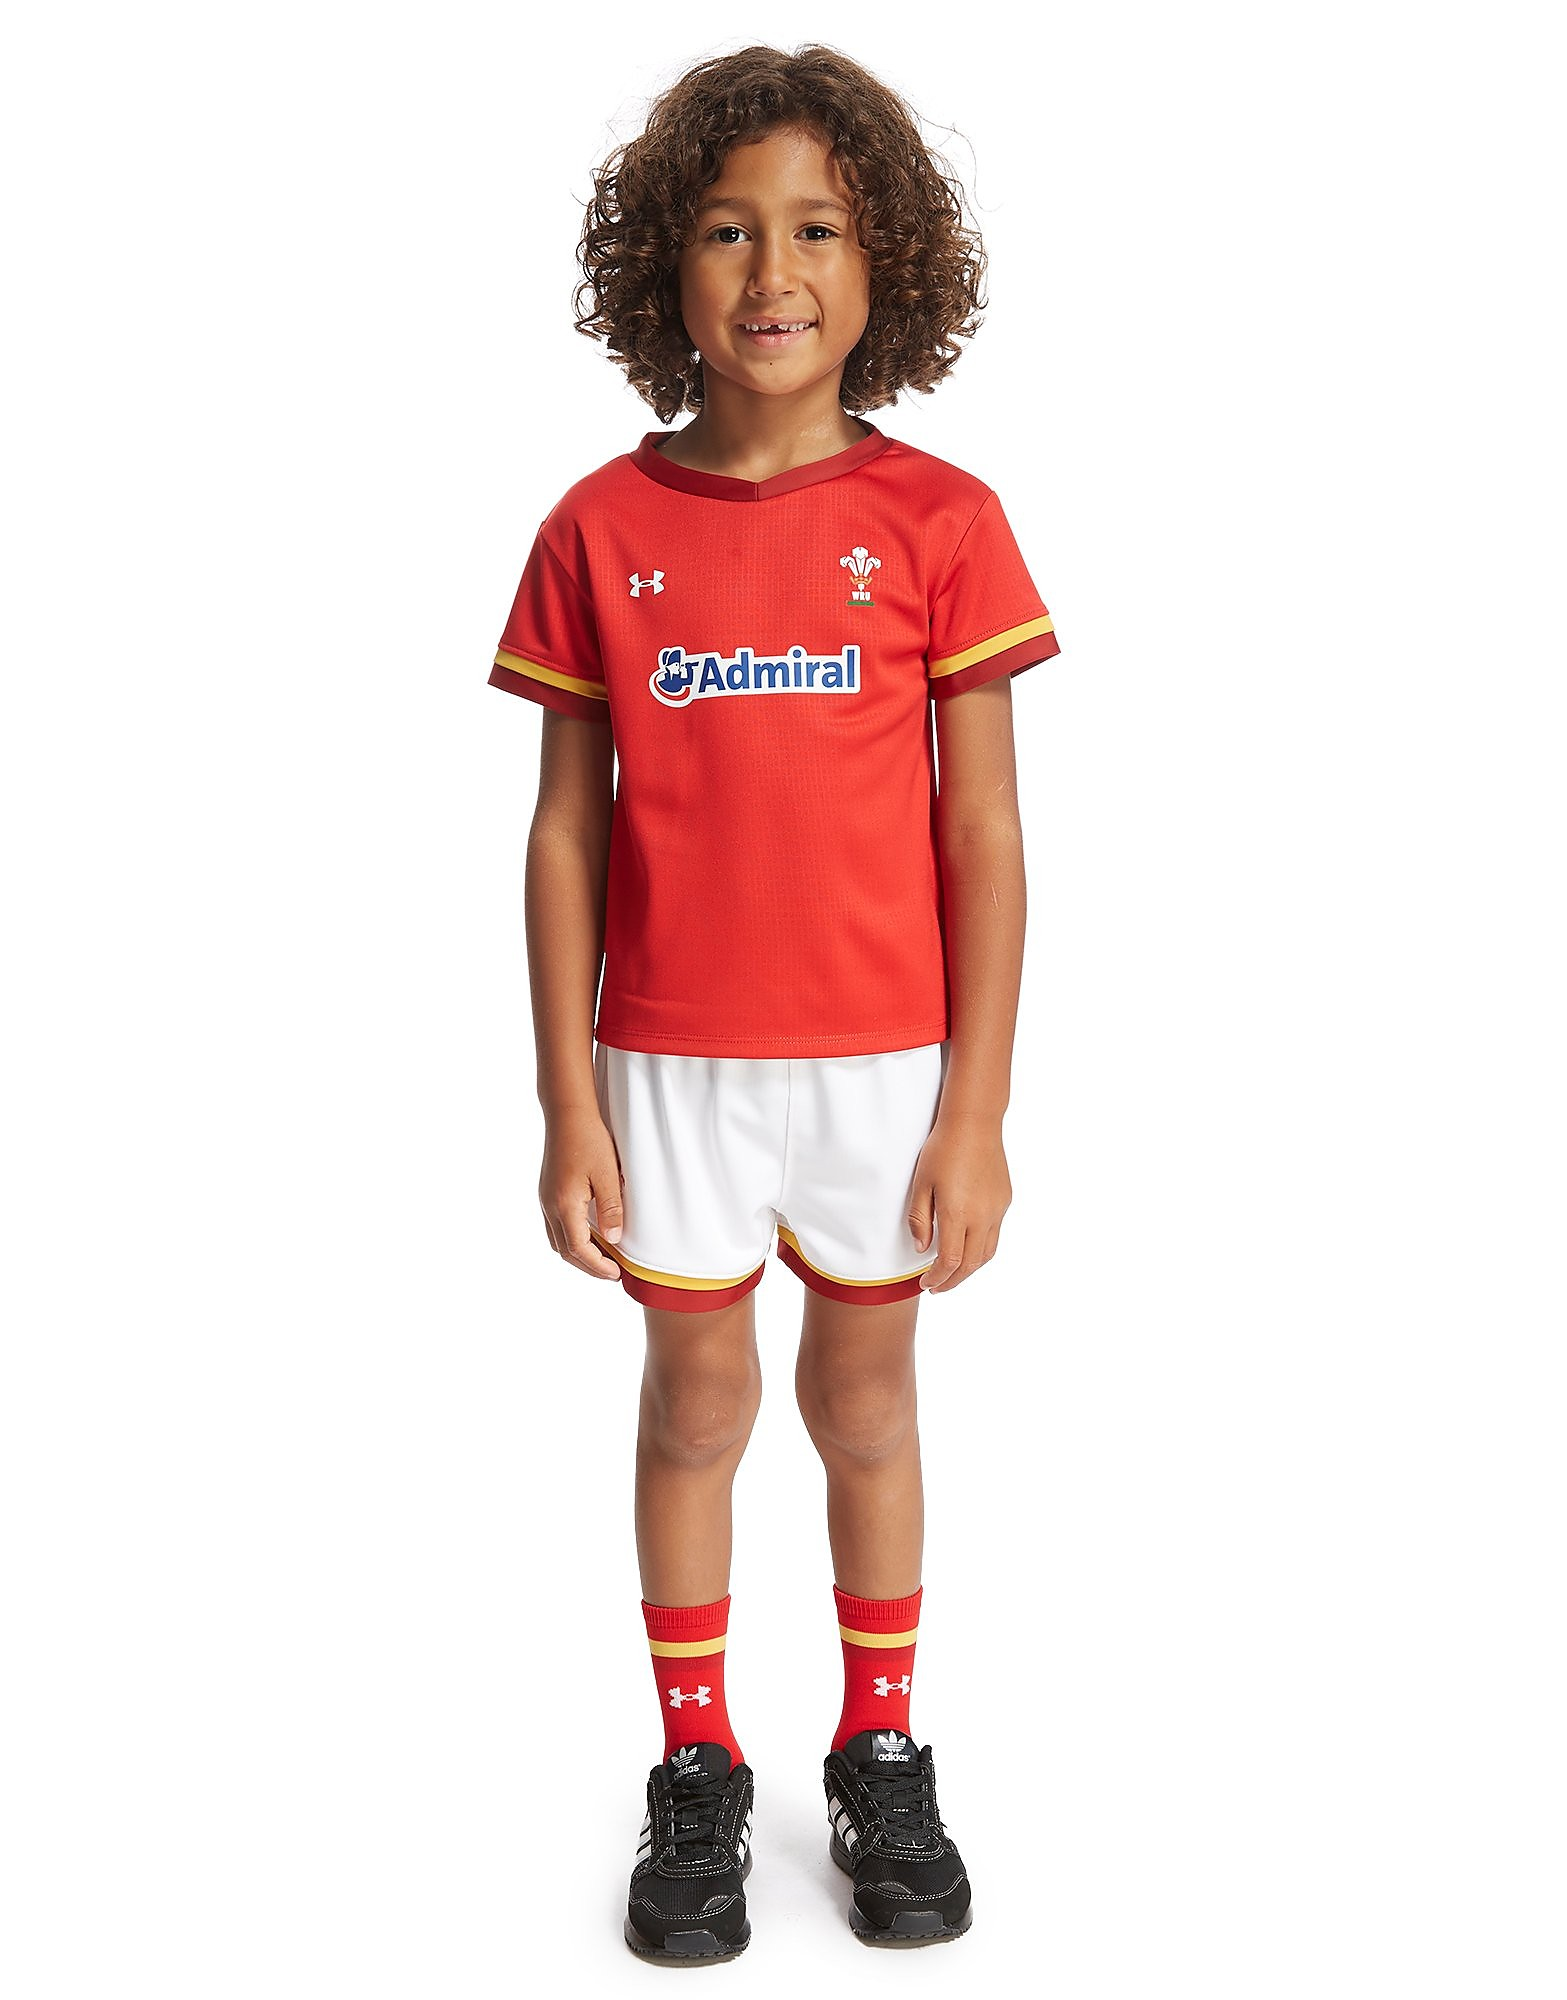 Under Armour Wales RU Home 2015/16 Kit Children